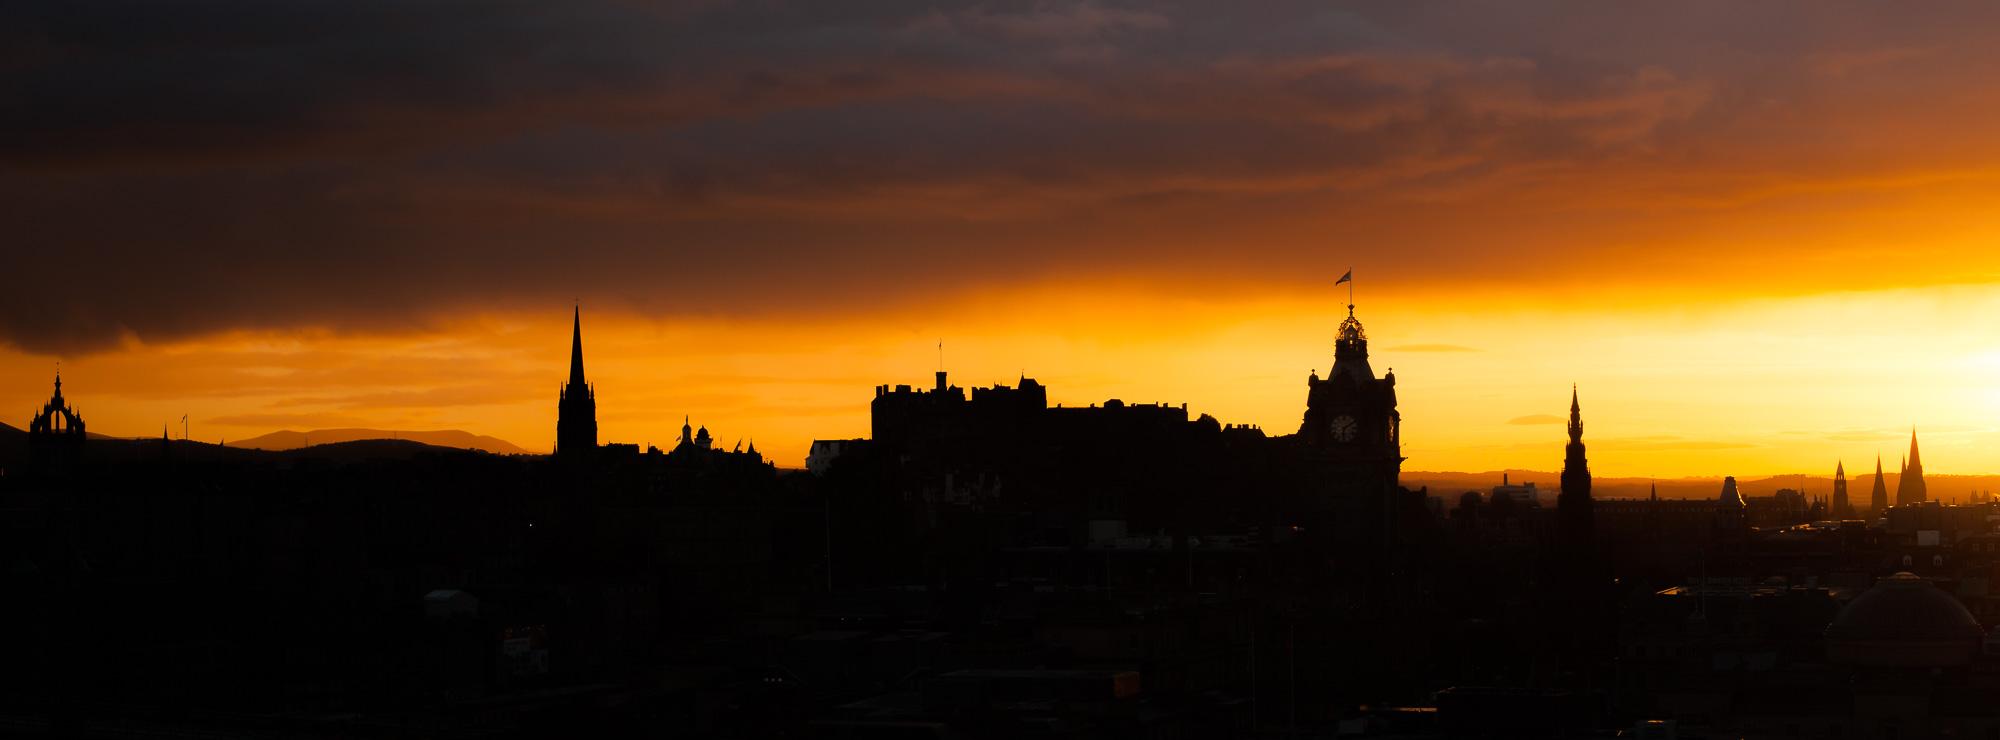 201510_Edinburgh_Stuart McMillan Photography_015.jpg